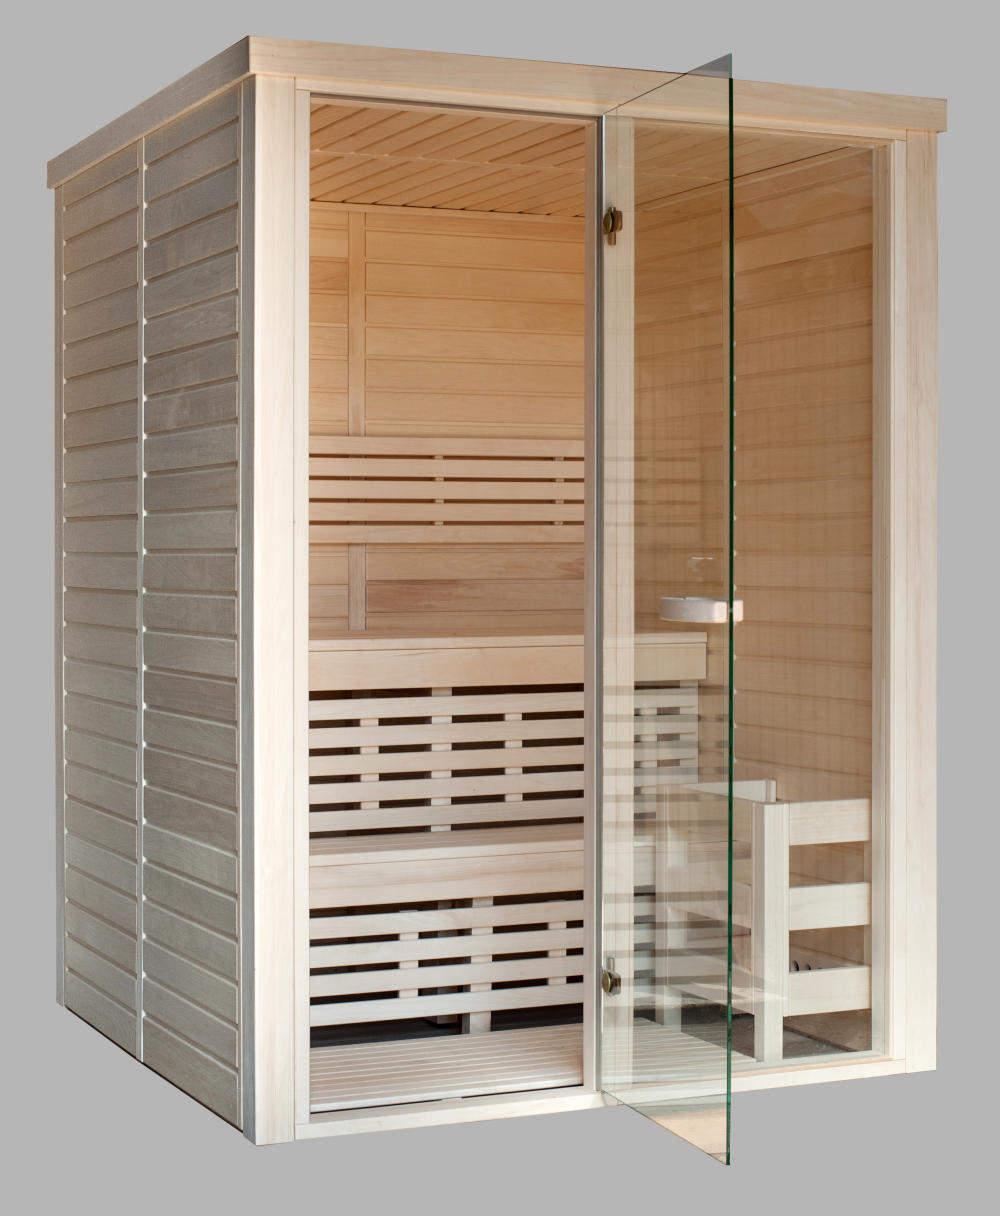 Sauna da interni prefabbricata in legno Aspen